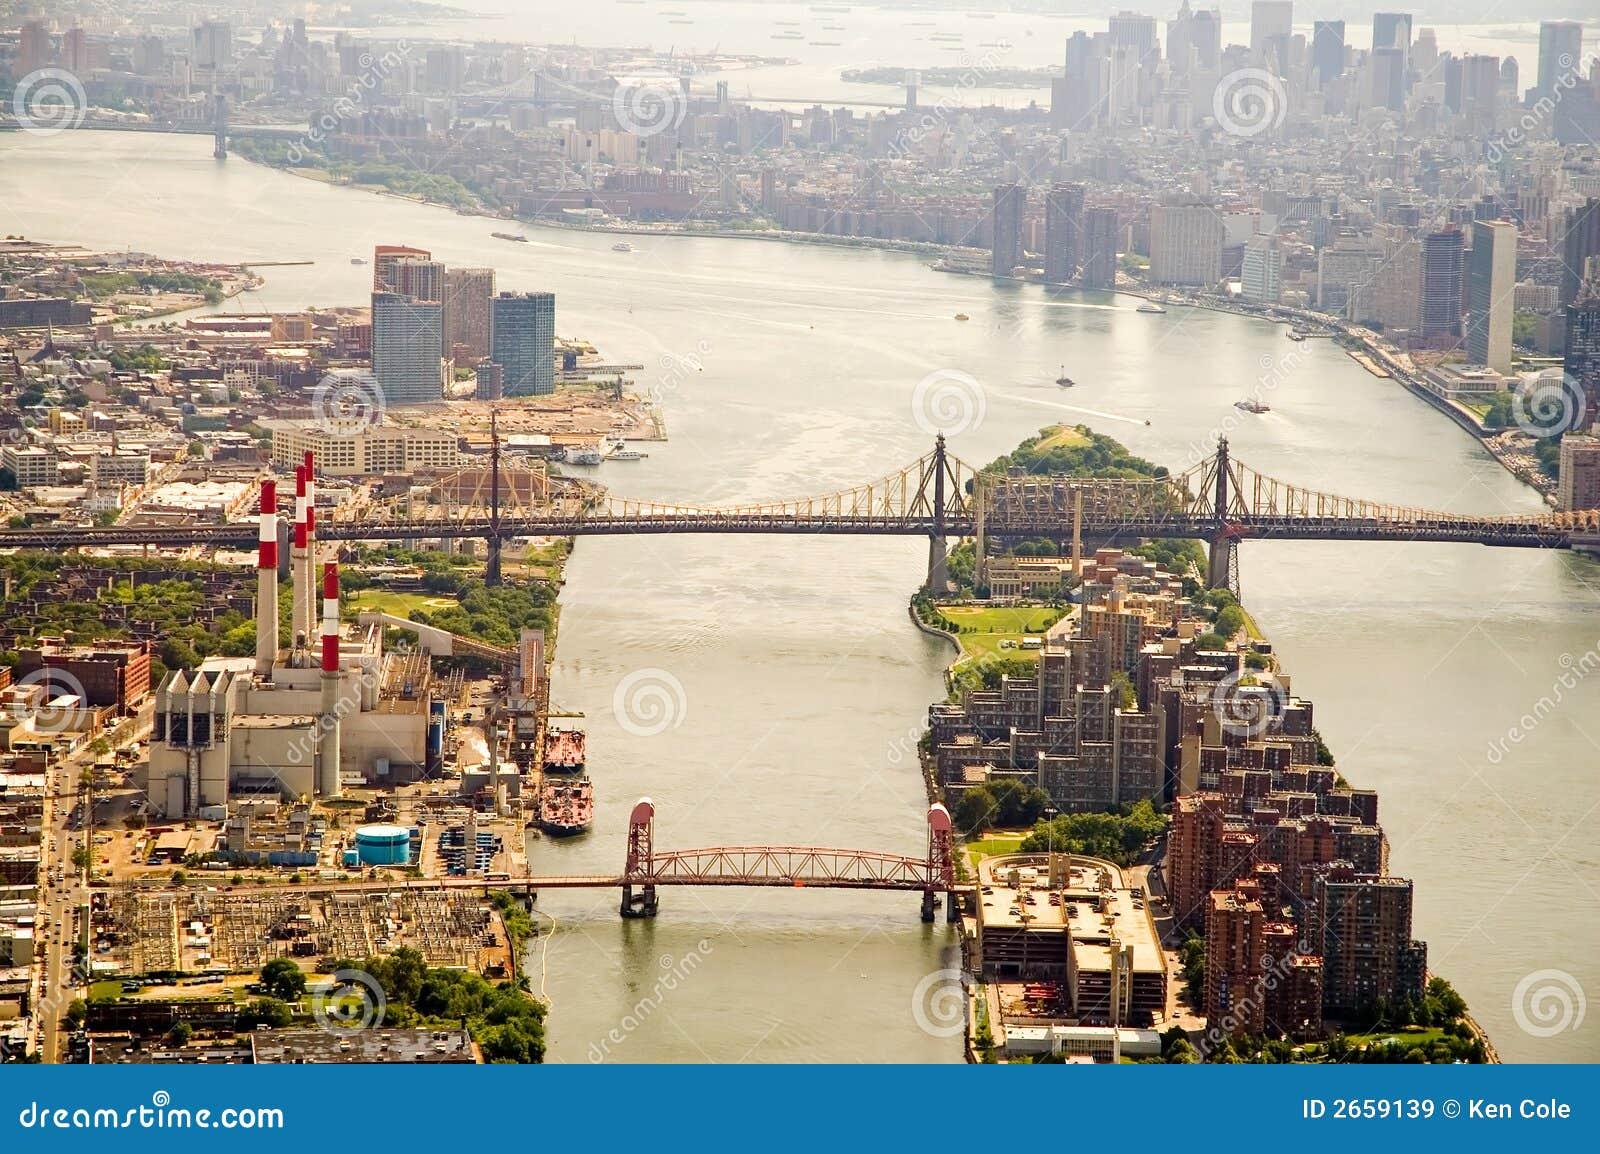 East River New York City